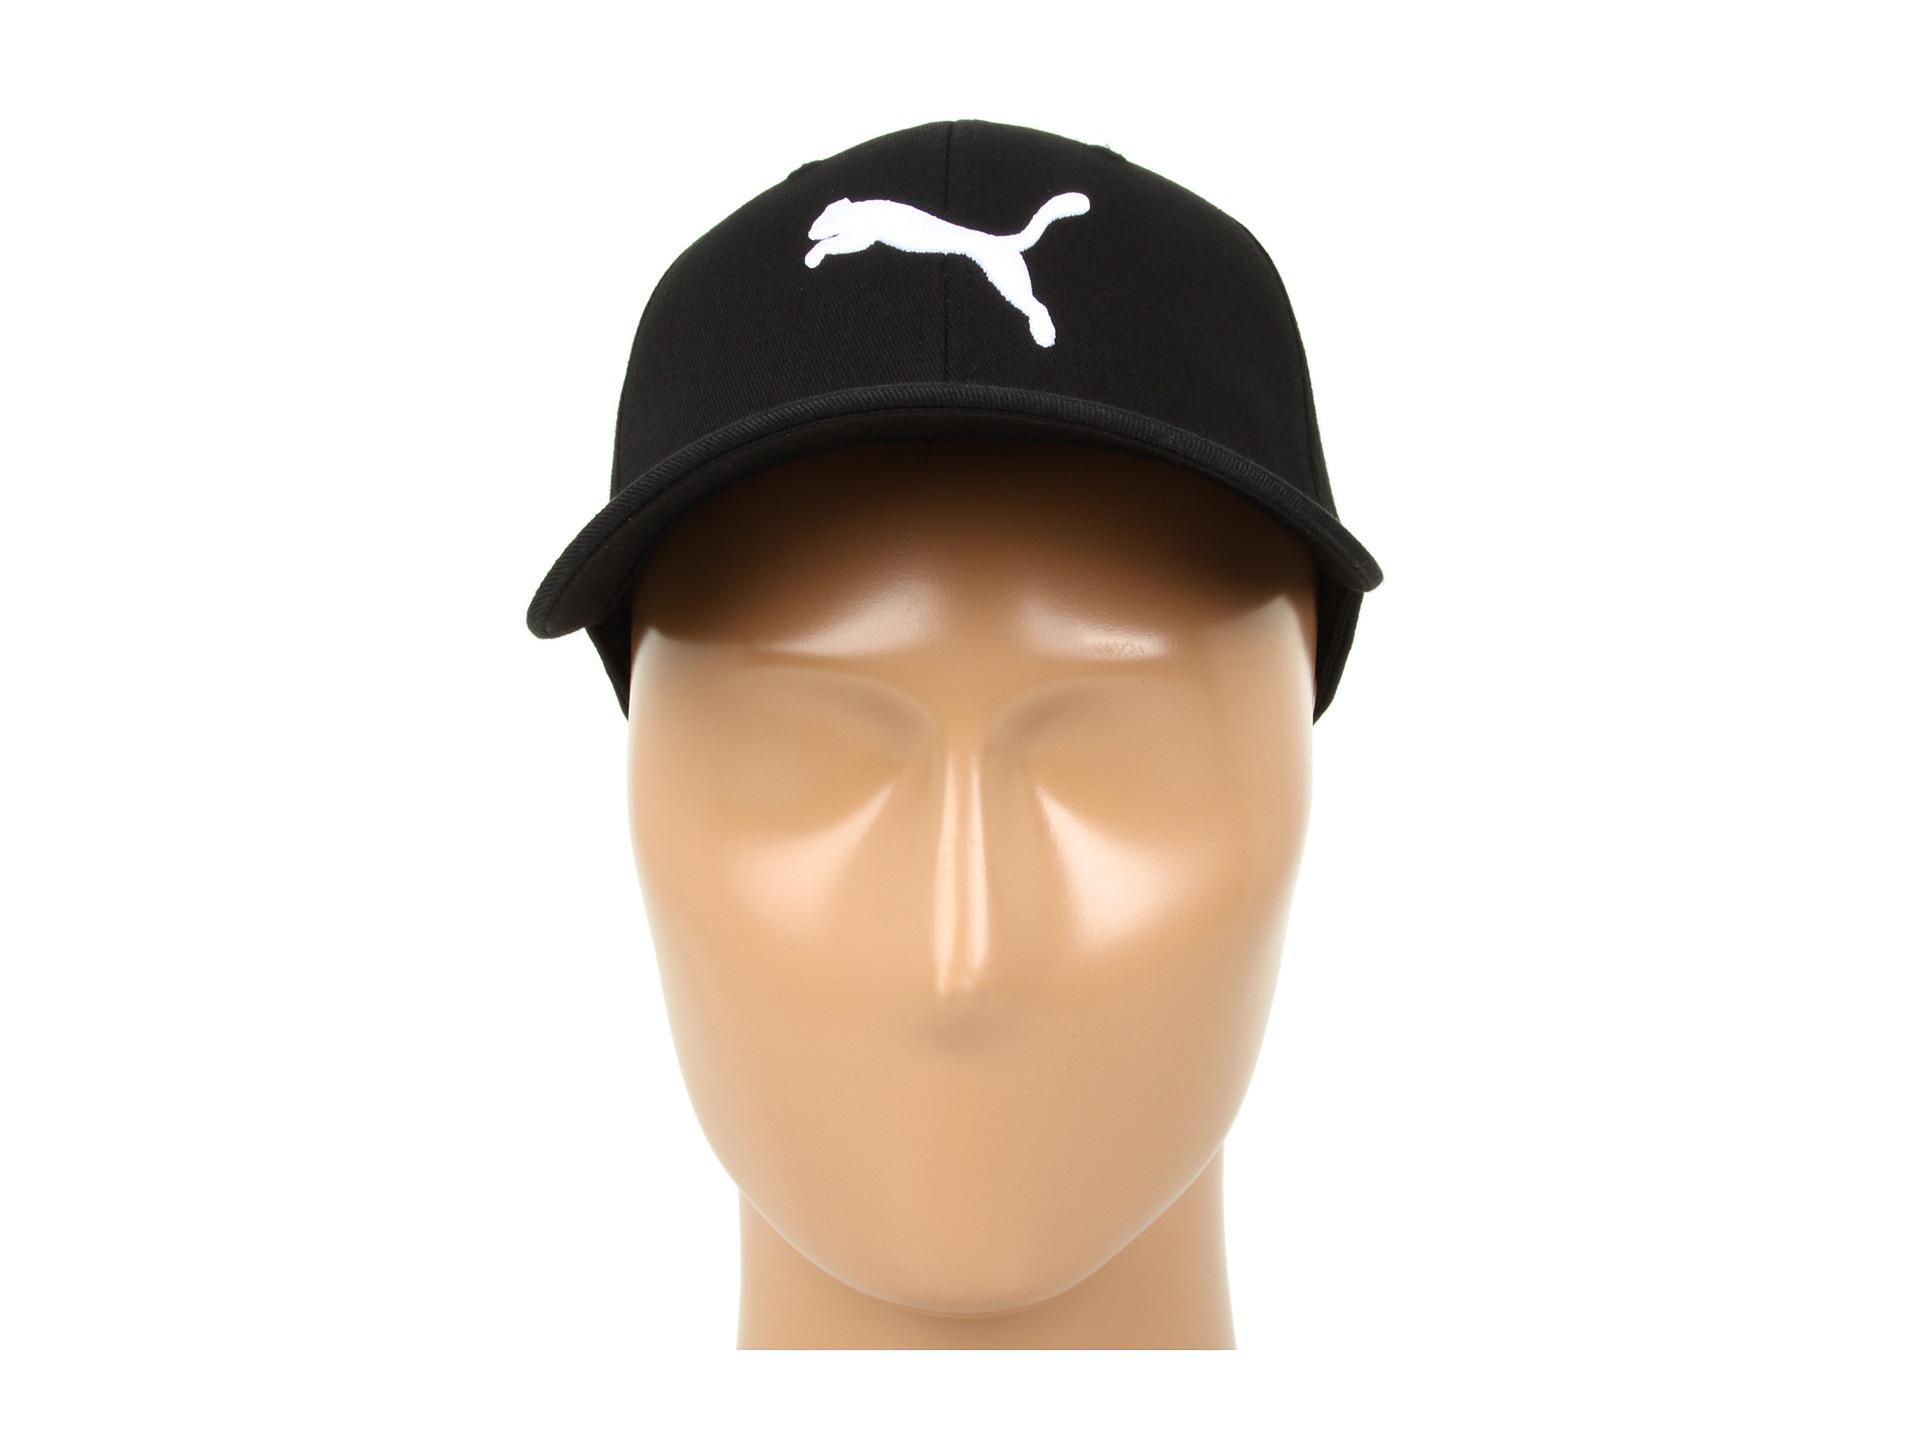 Lyst - PUMA 9 Lives Flex Fit Cap in Black for Men 974bcb72f210